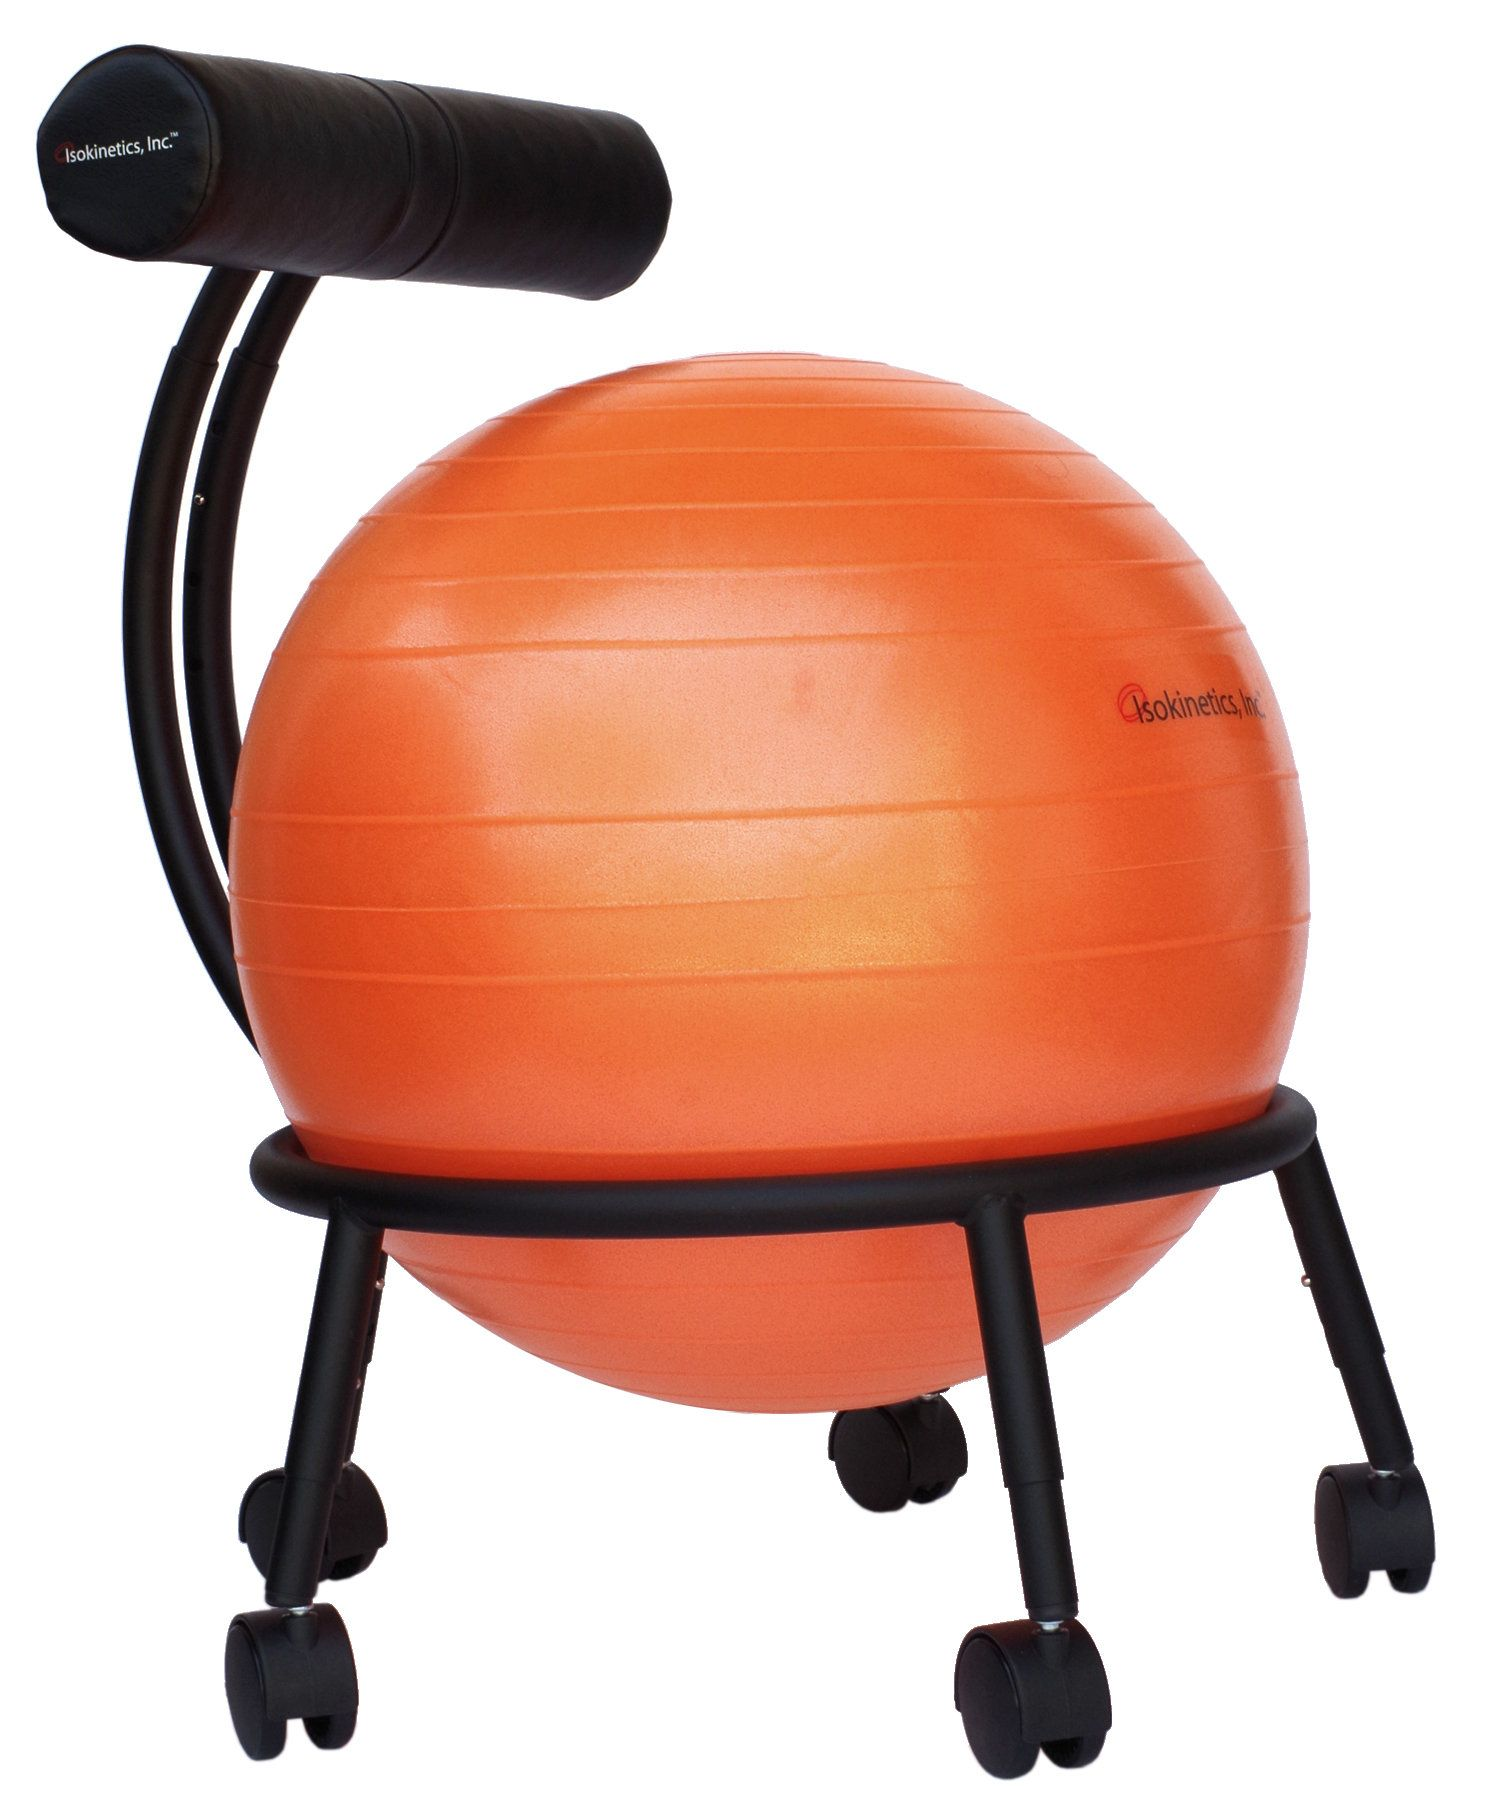 HighBack Exercise Ball Chair Ball chair, Adjustable